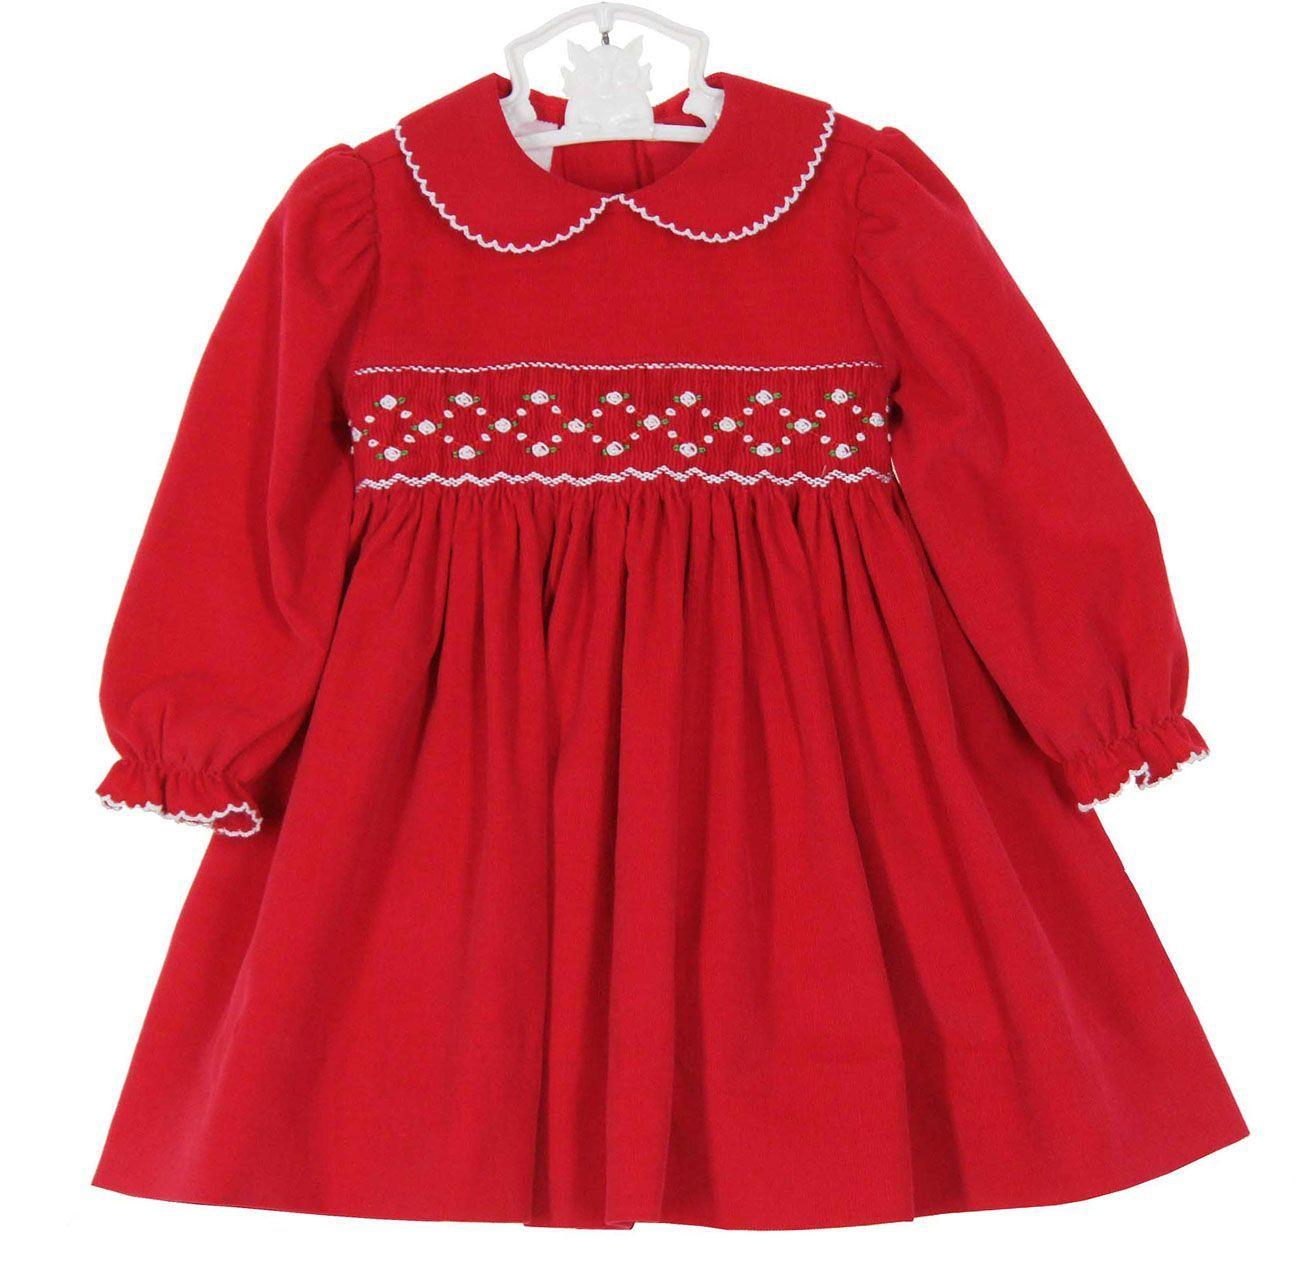 0f2fa4189660 NEW Petit Bebe by Anavini Red Cotton Corduroy Smocked Dress $60.00 ...